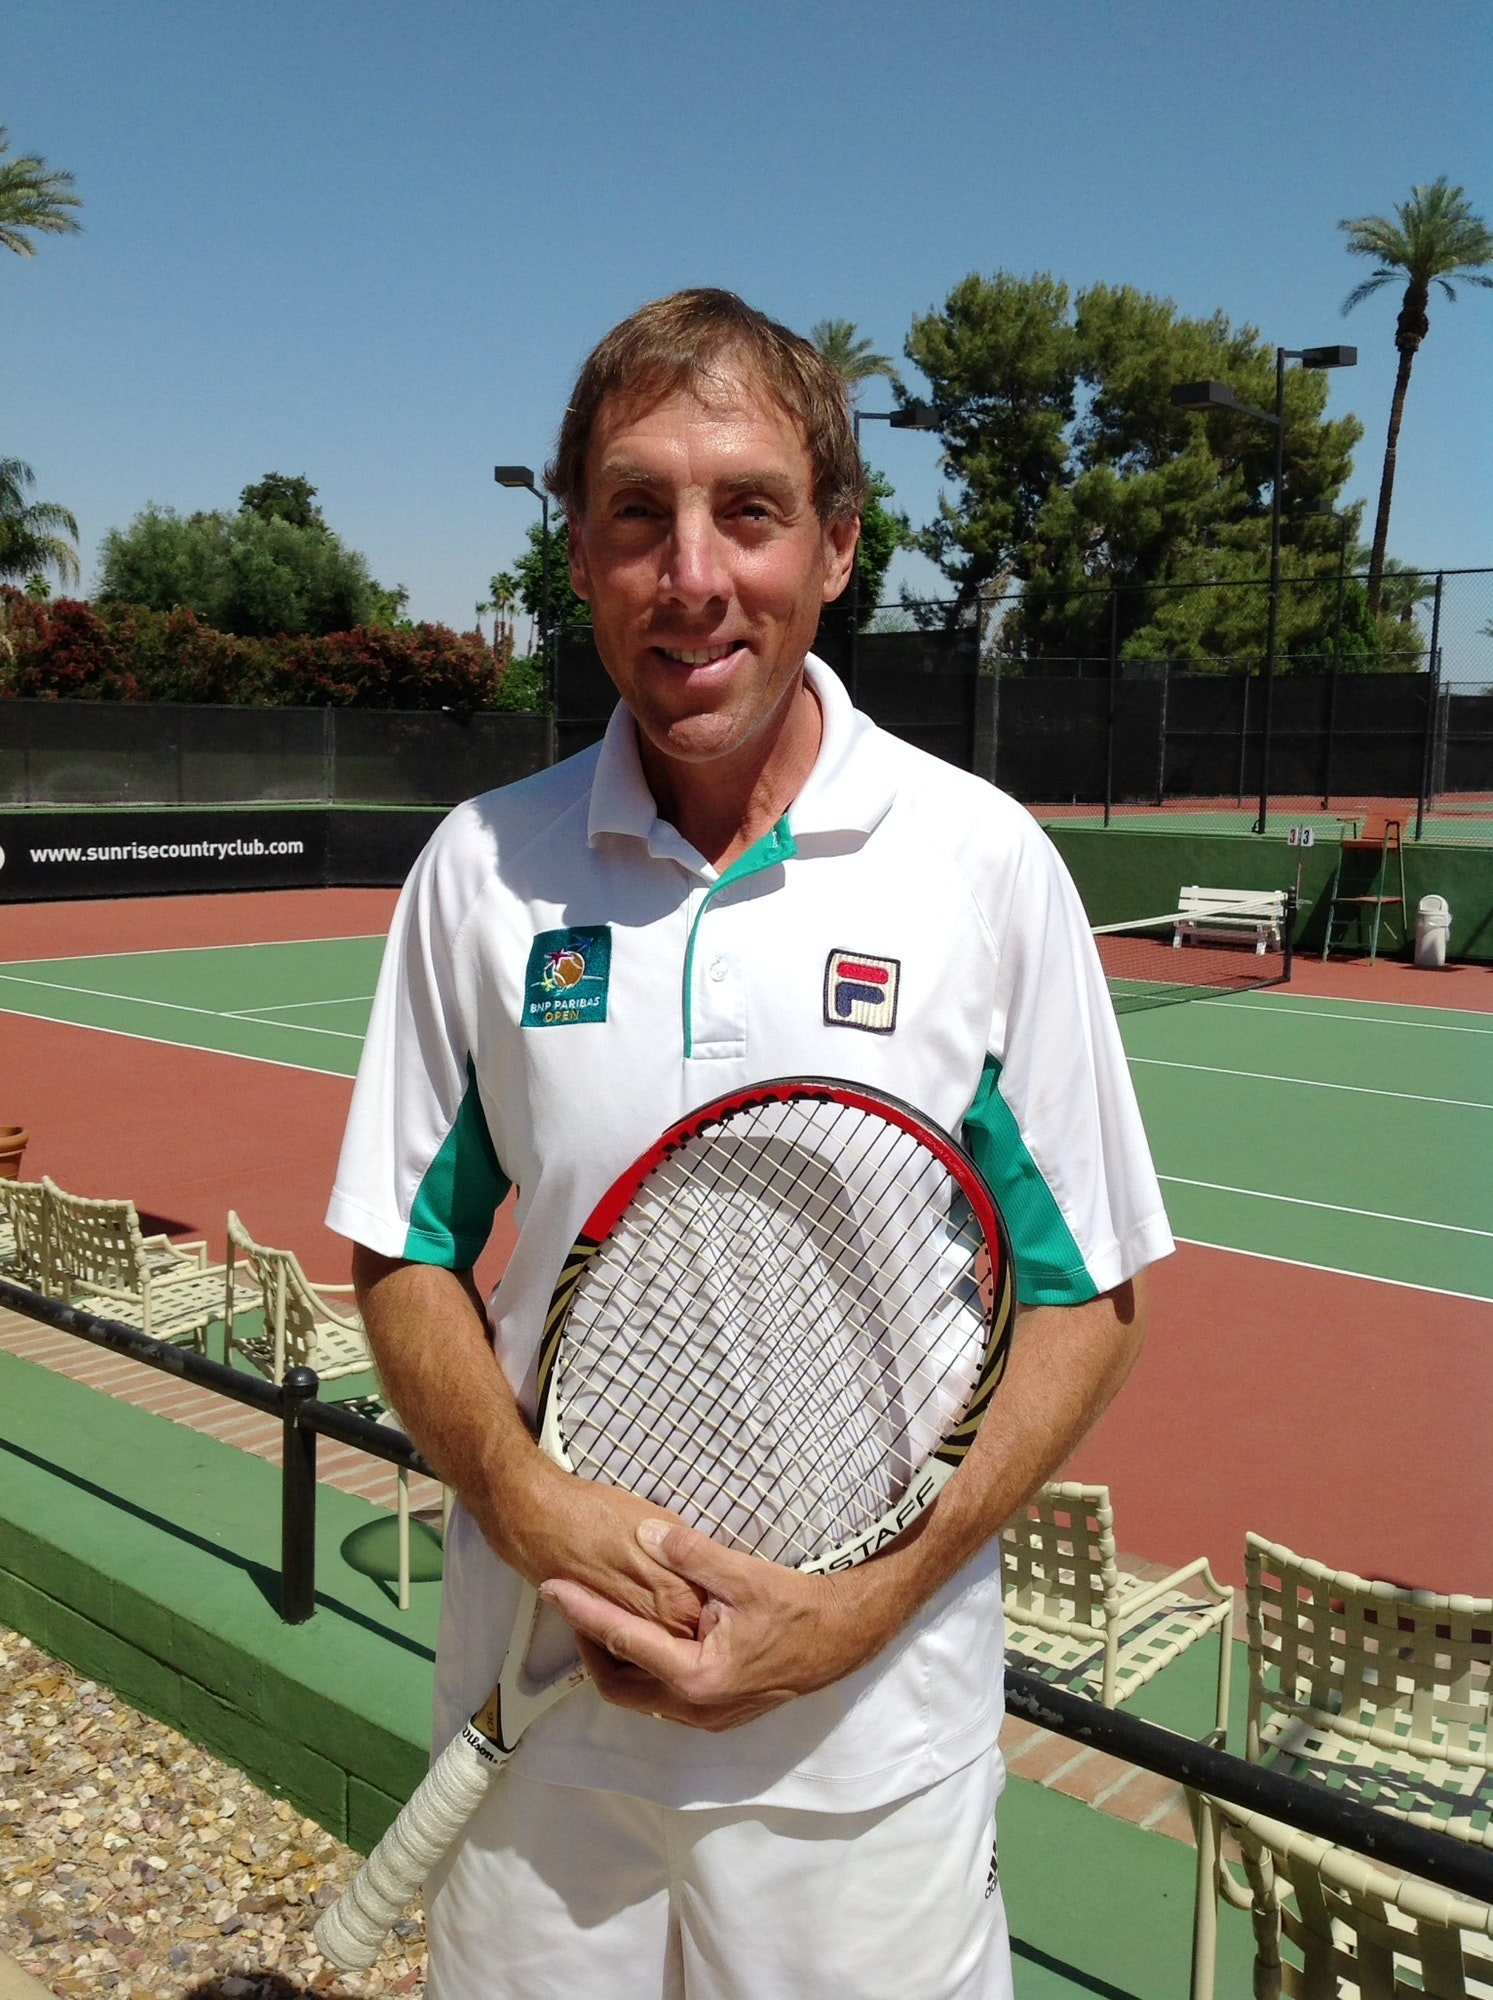 Kent A. teaches tennis lessons in Kalaheo, HI